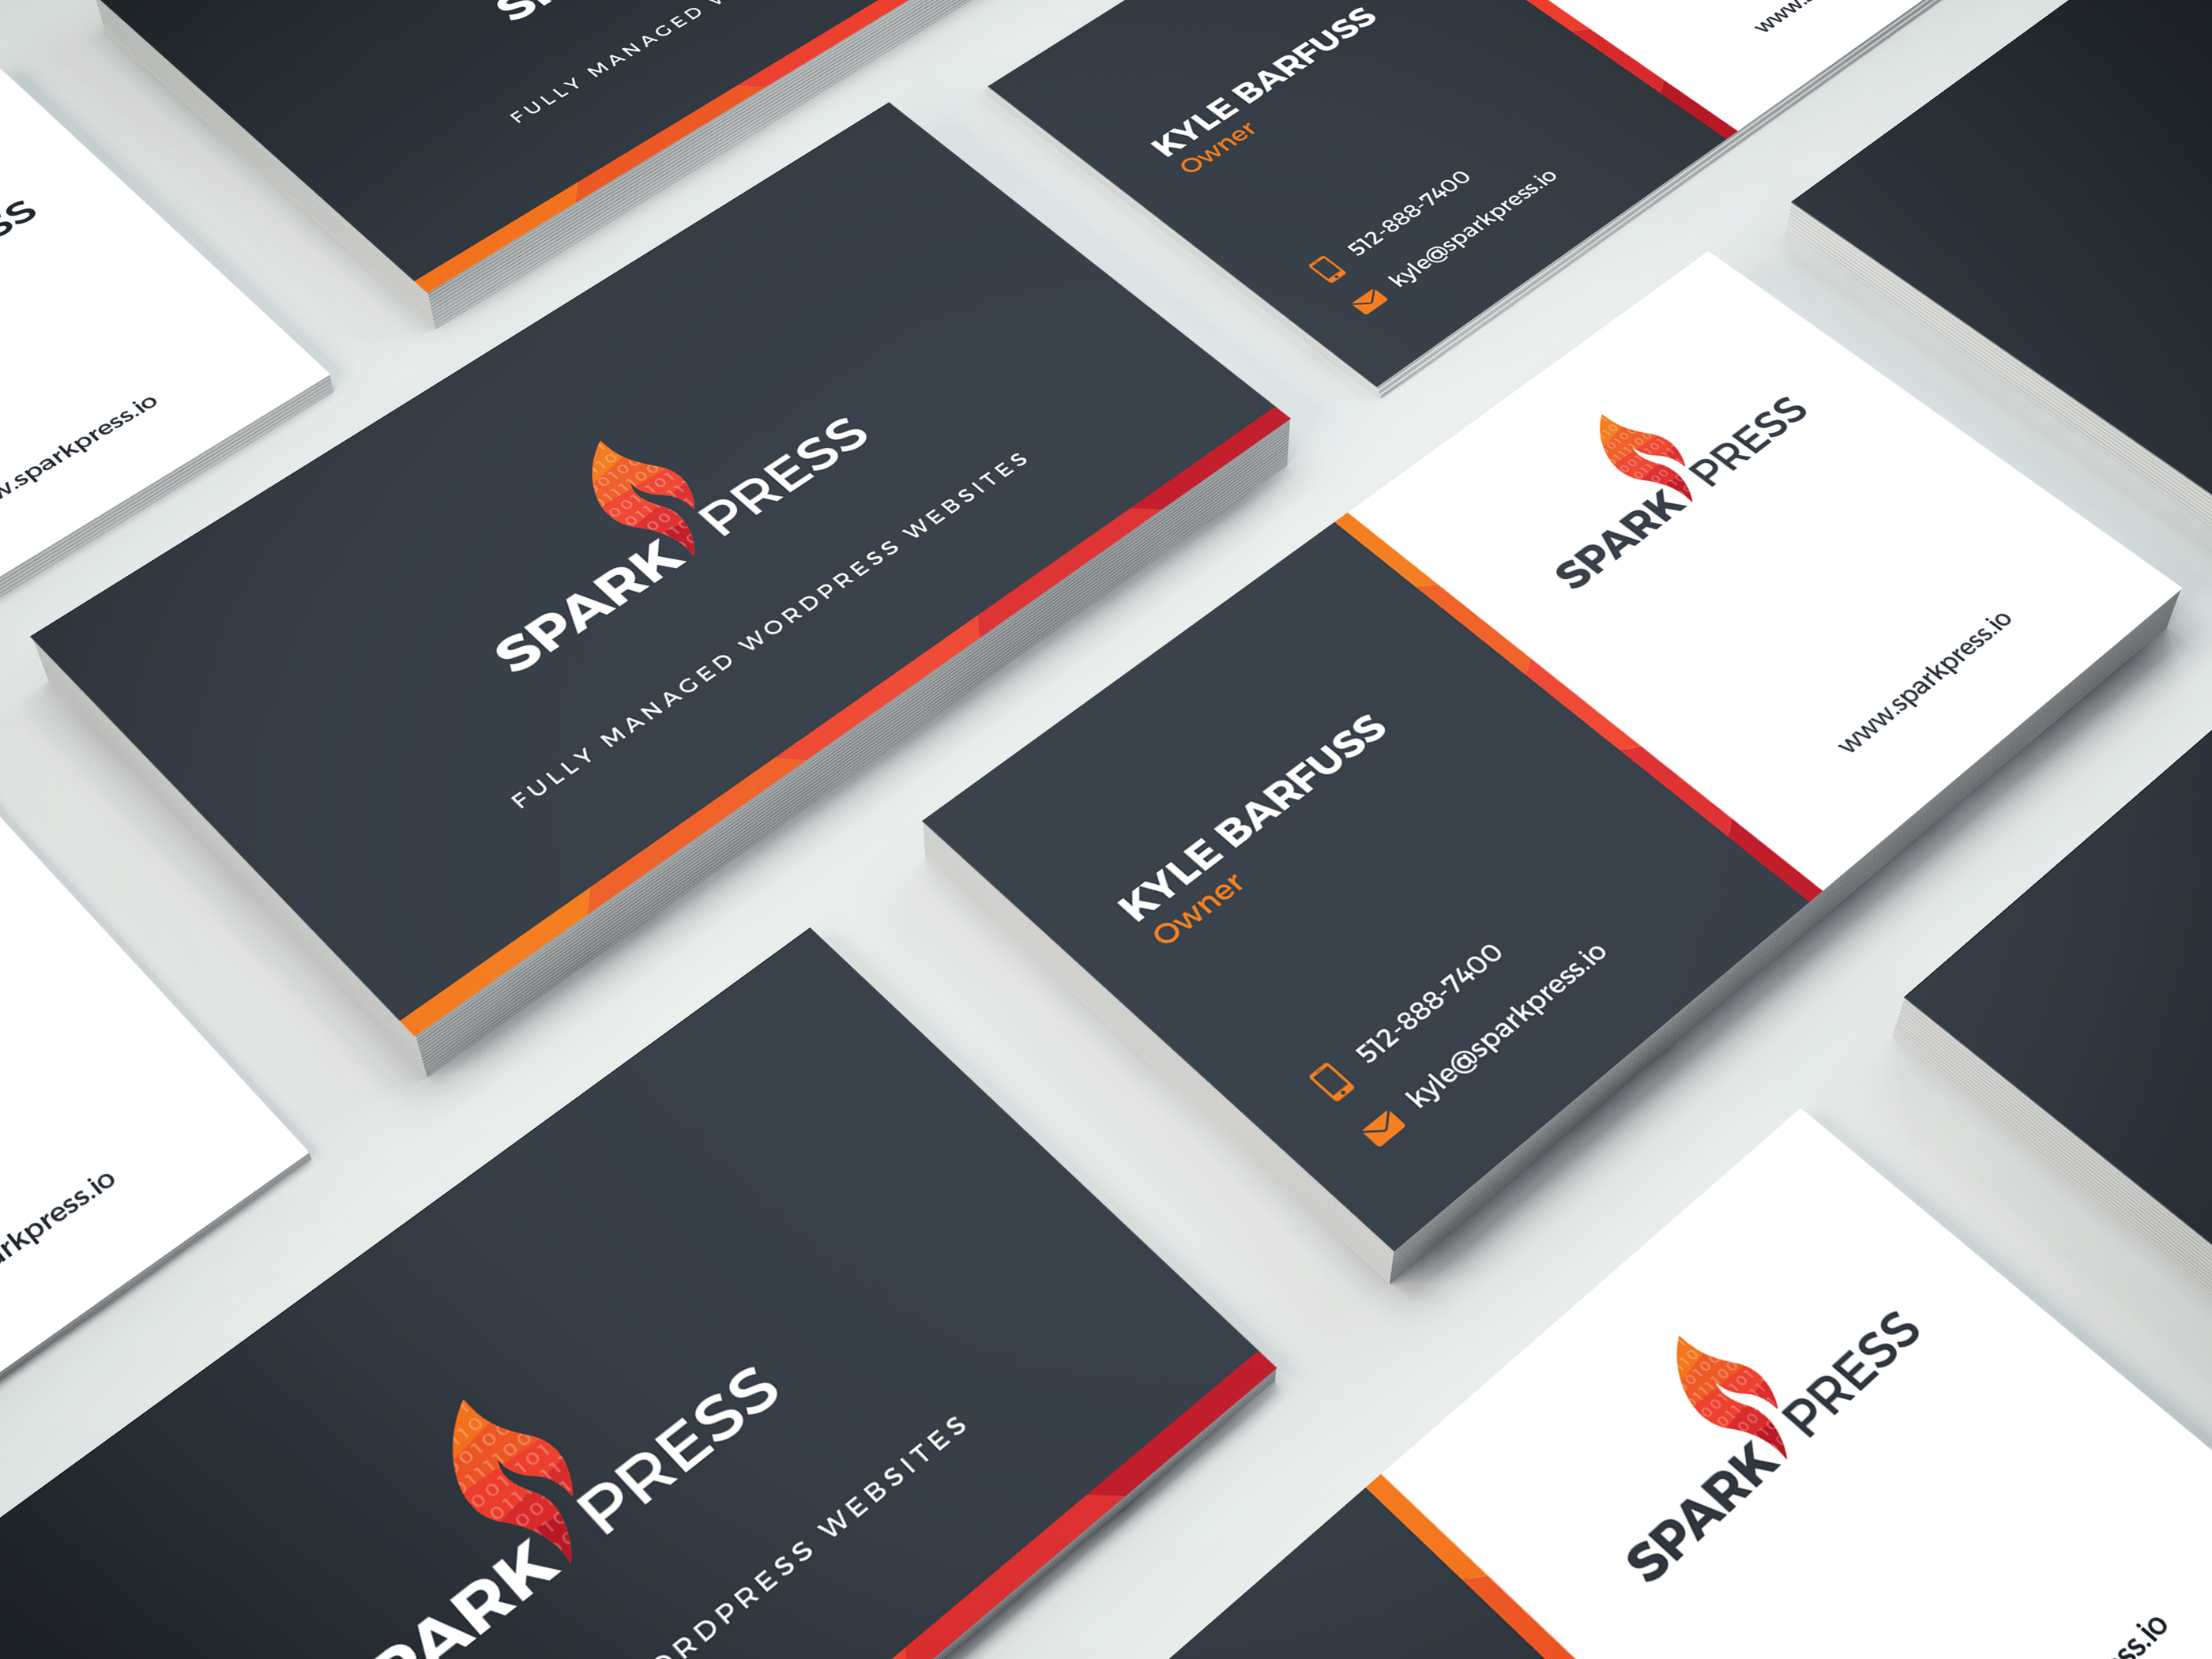 SparkPress Business Cards